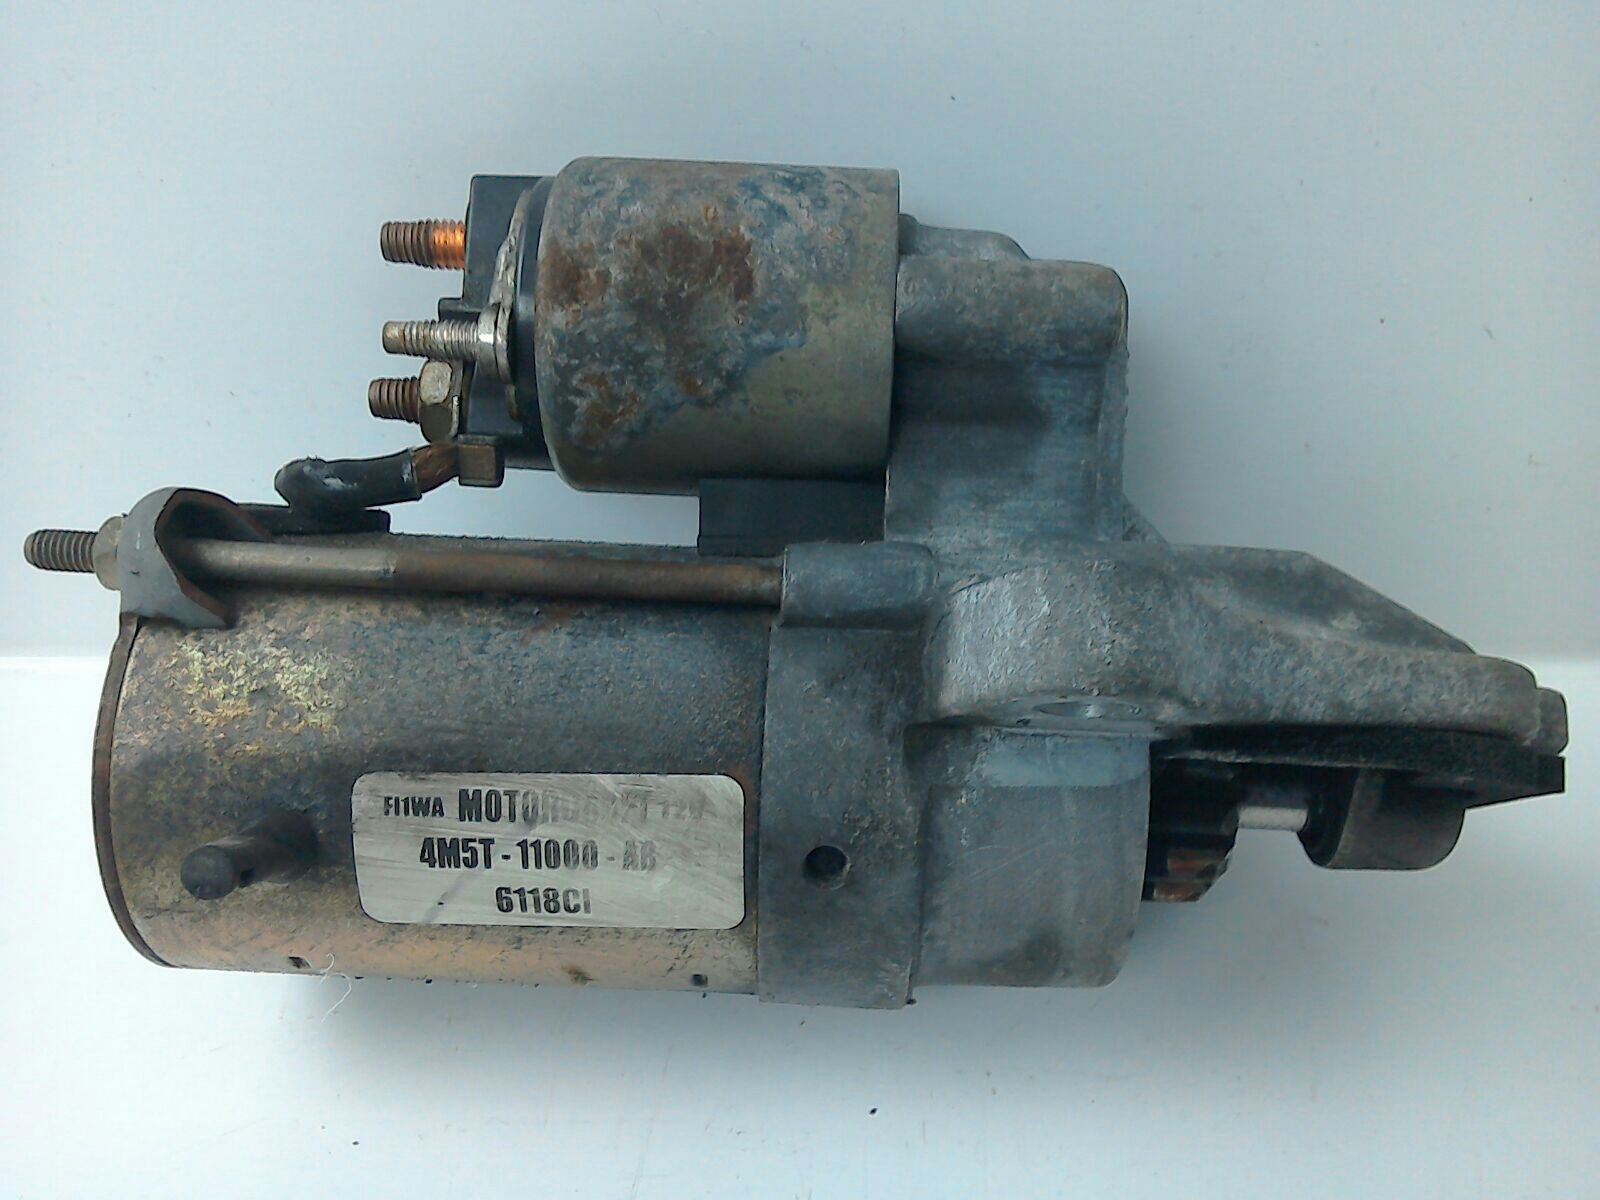 ... FORD FOCUS MK2 1.8 16V STARTER MOTOR 5 SPEED MANUAL MOTORCRAFT  4M5T11000AB 2006 ...